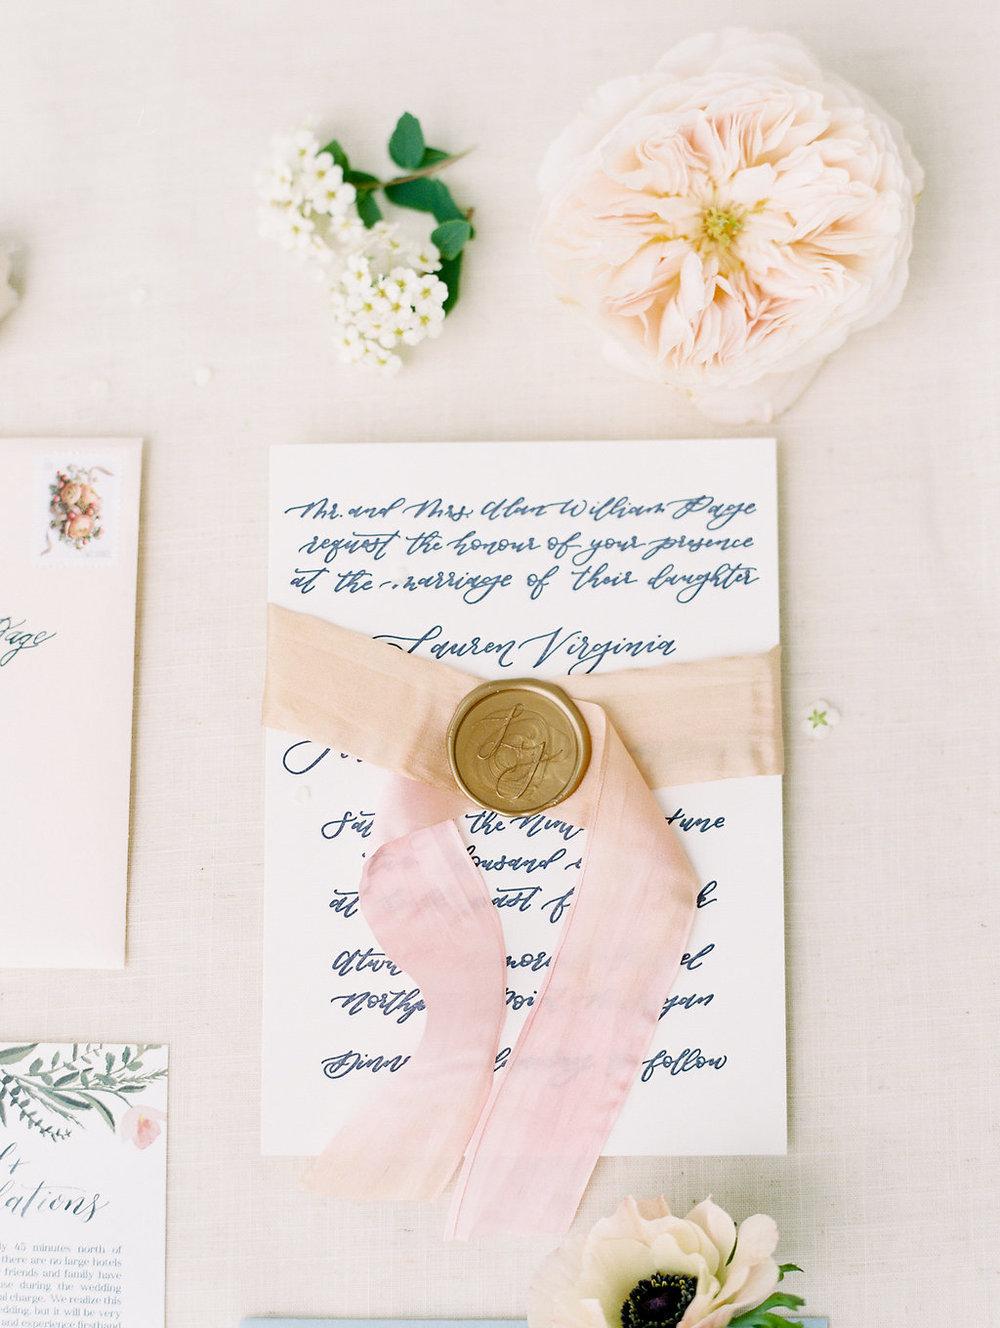 Coffman+Wedding+Details-39.jpg